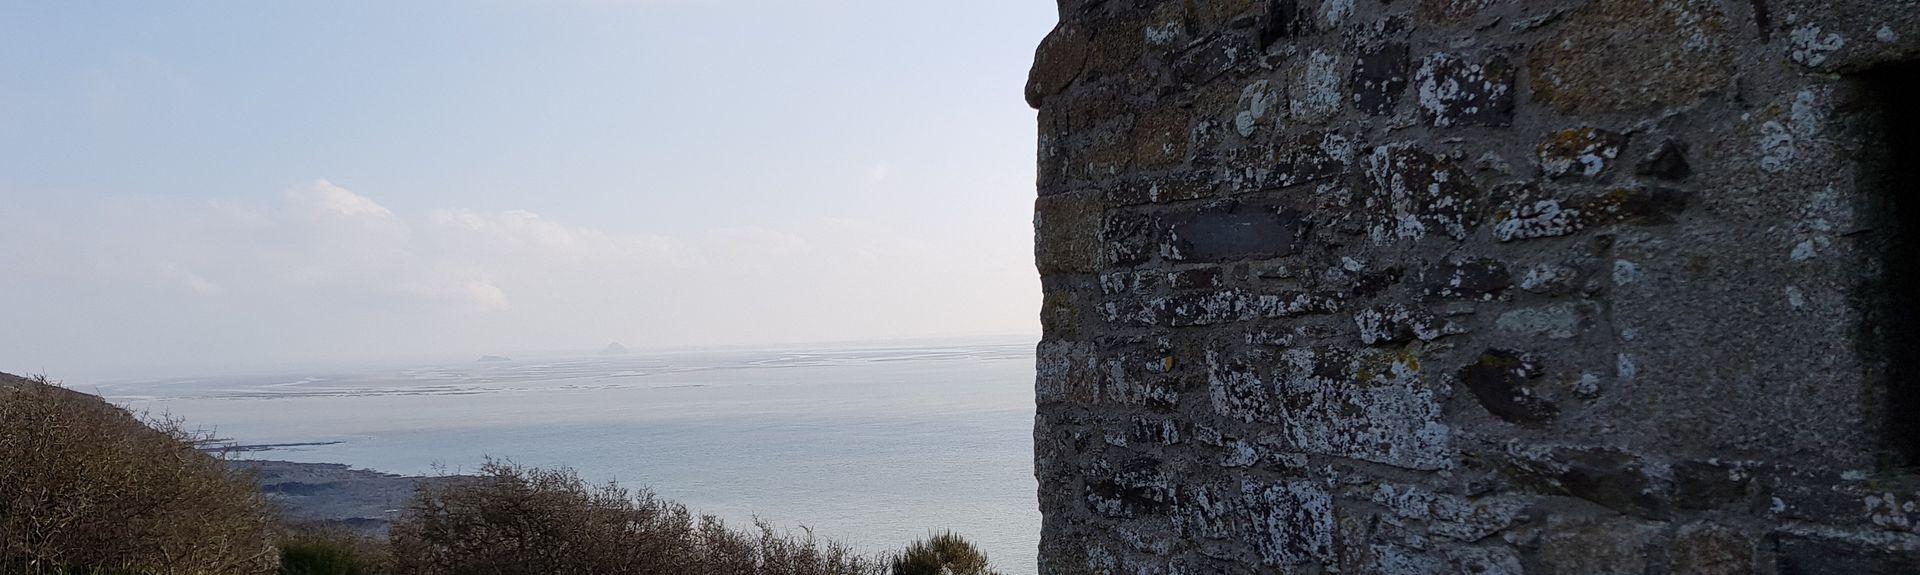 Coudeville-sur-Mer, France